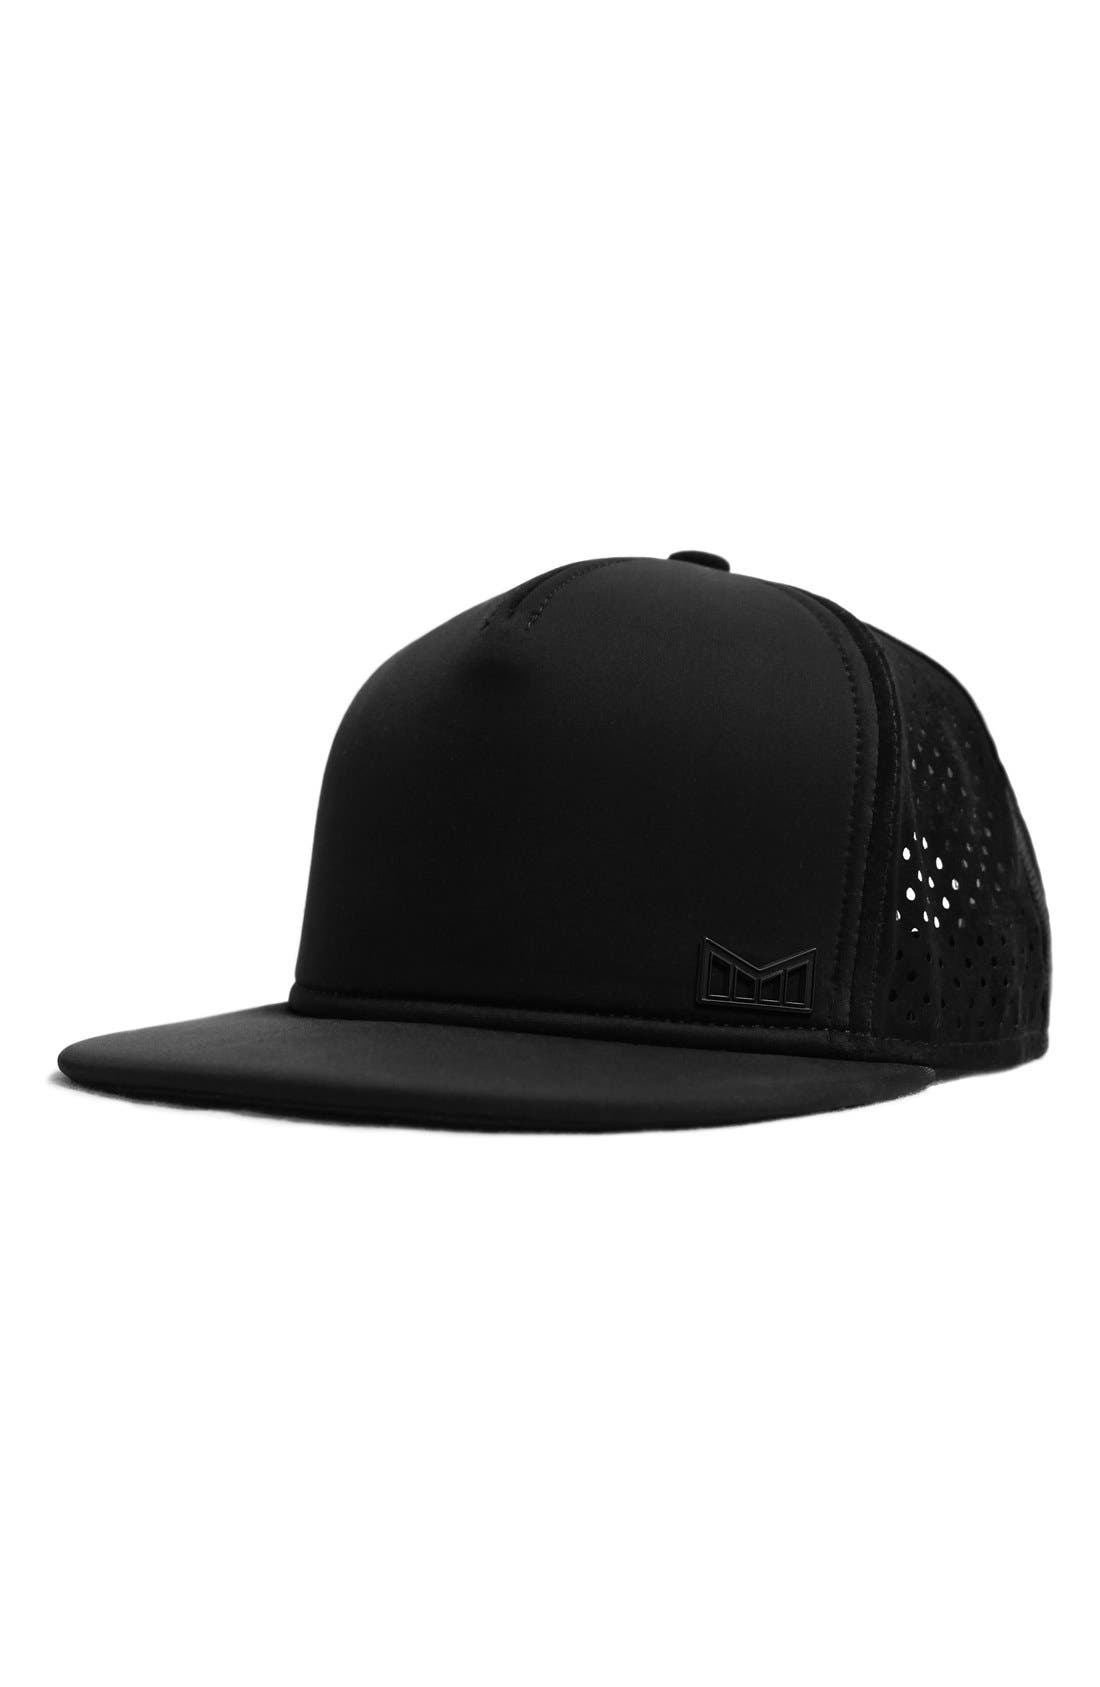 Melin 'The Sharpshooter' Snapback Baseball Cap